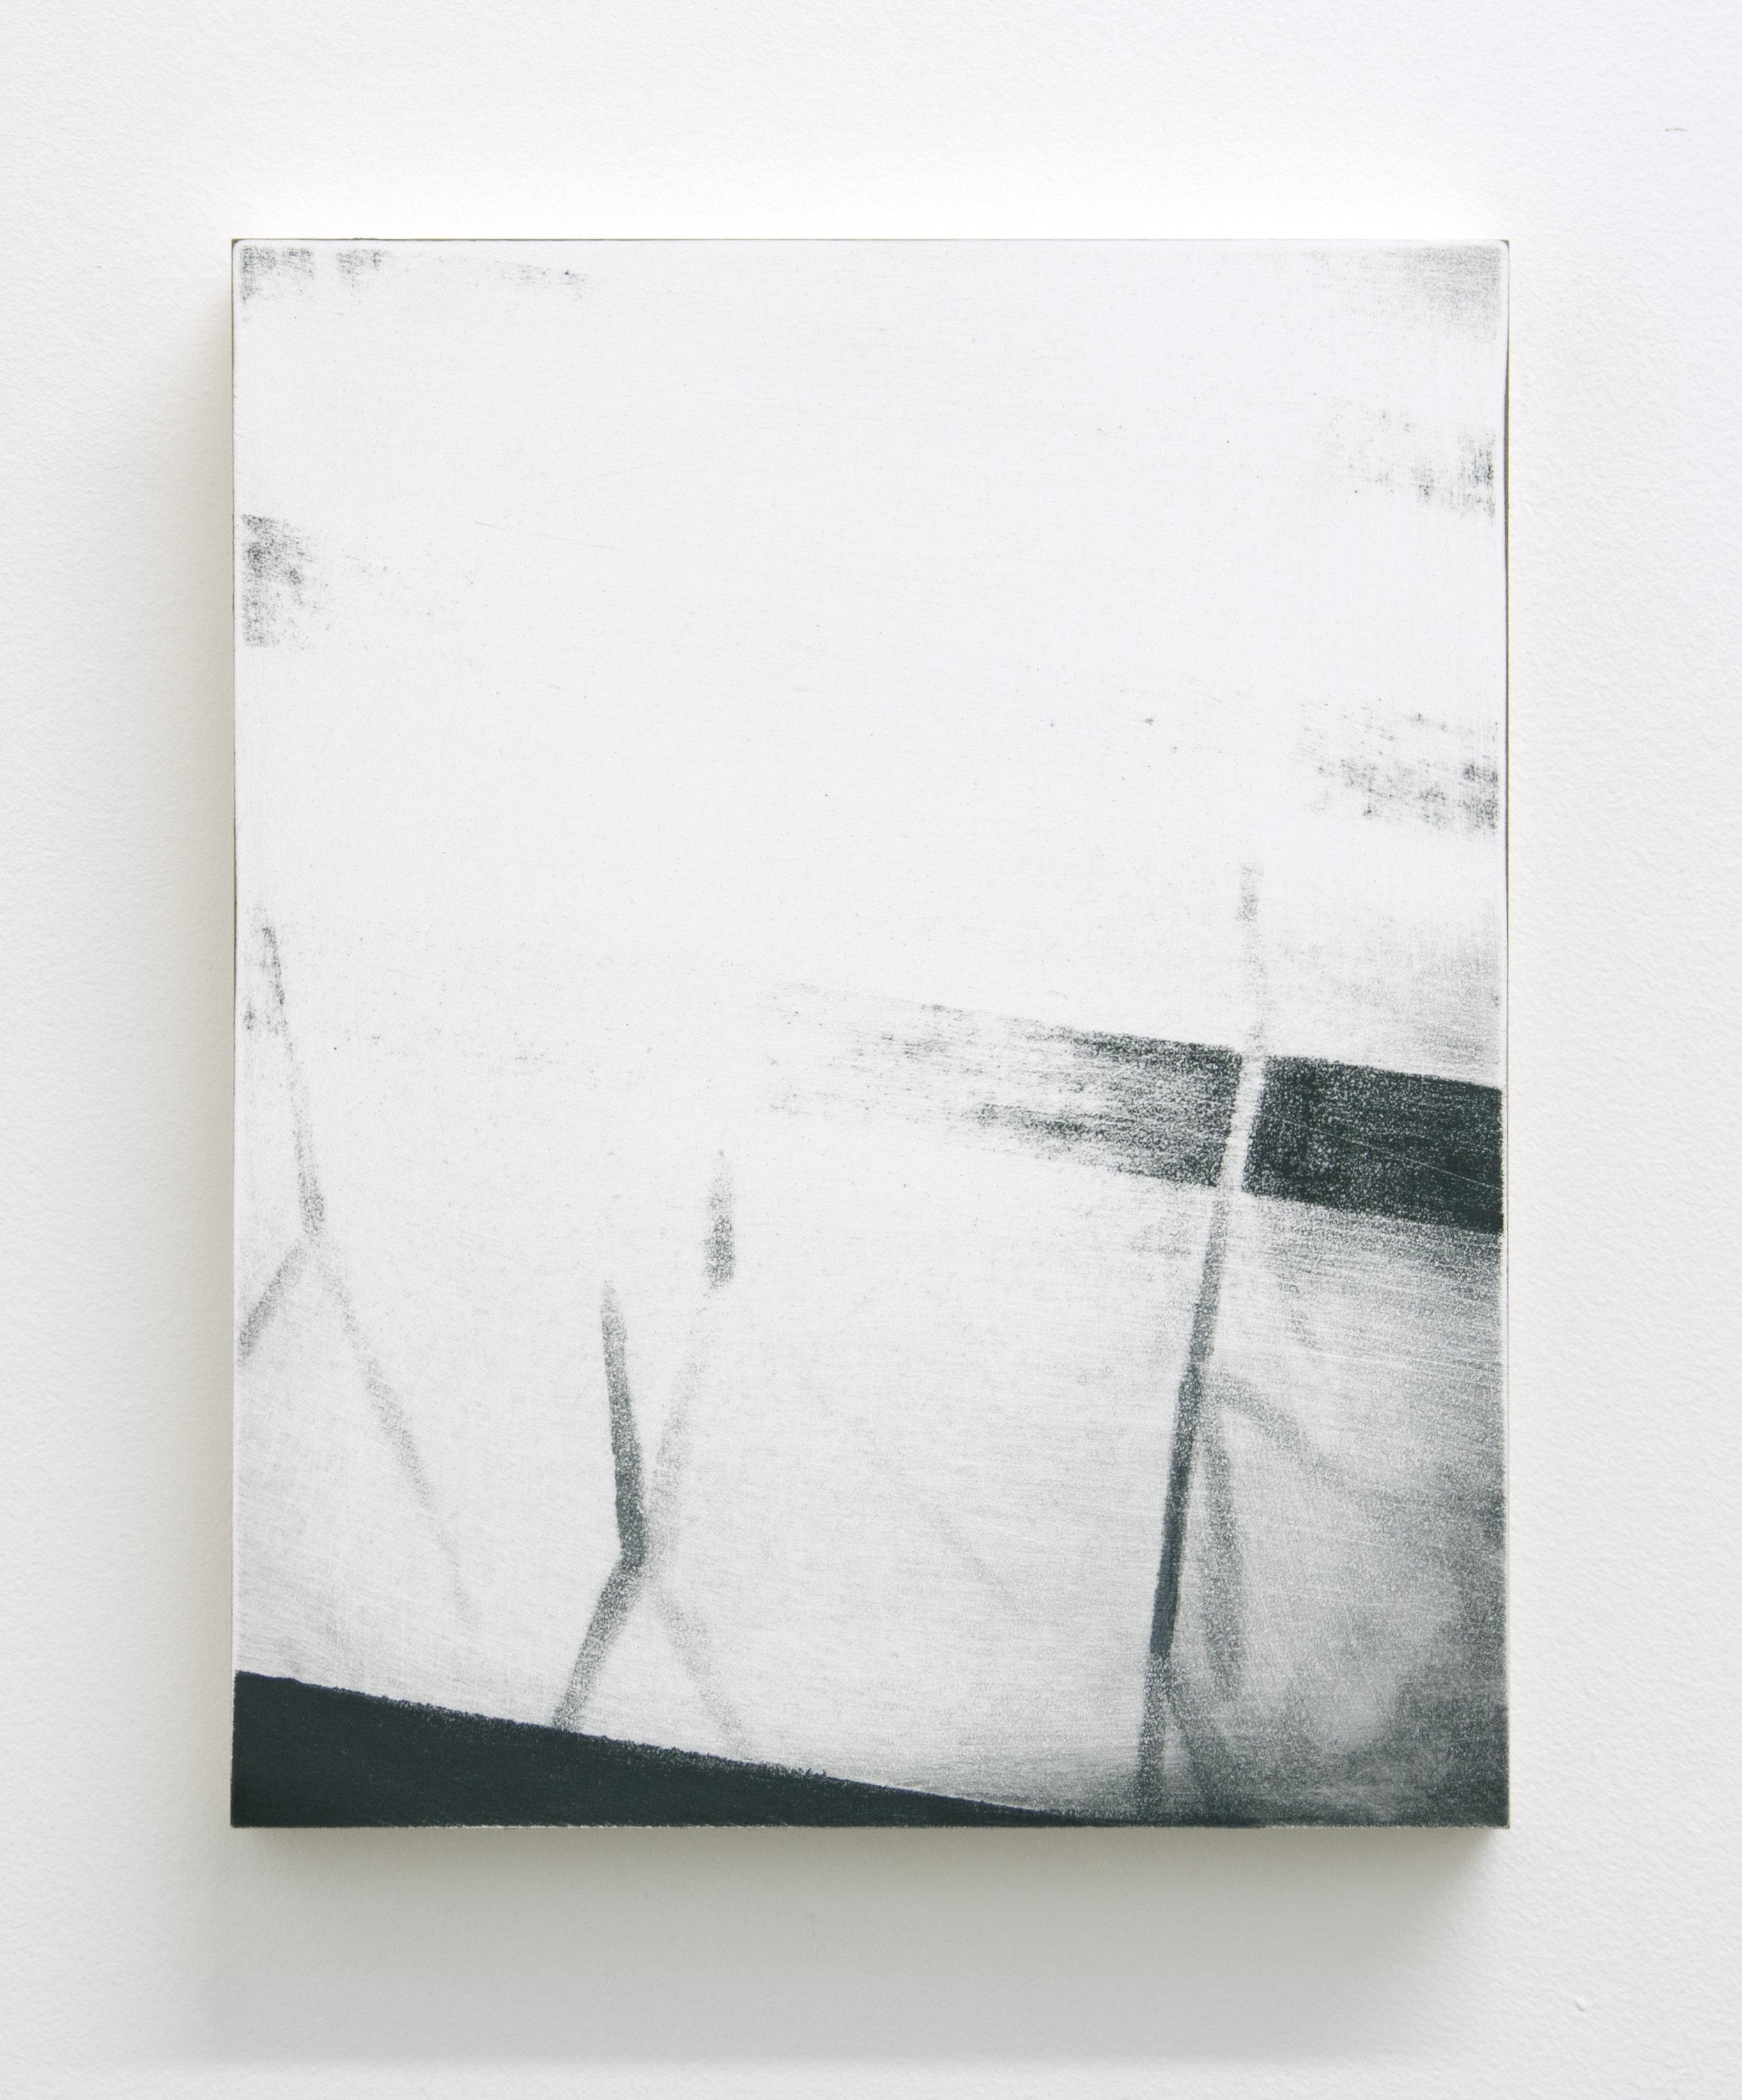 Threshold, 2015  Acrylic on panel, 10 x 8 inches